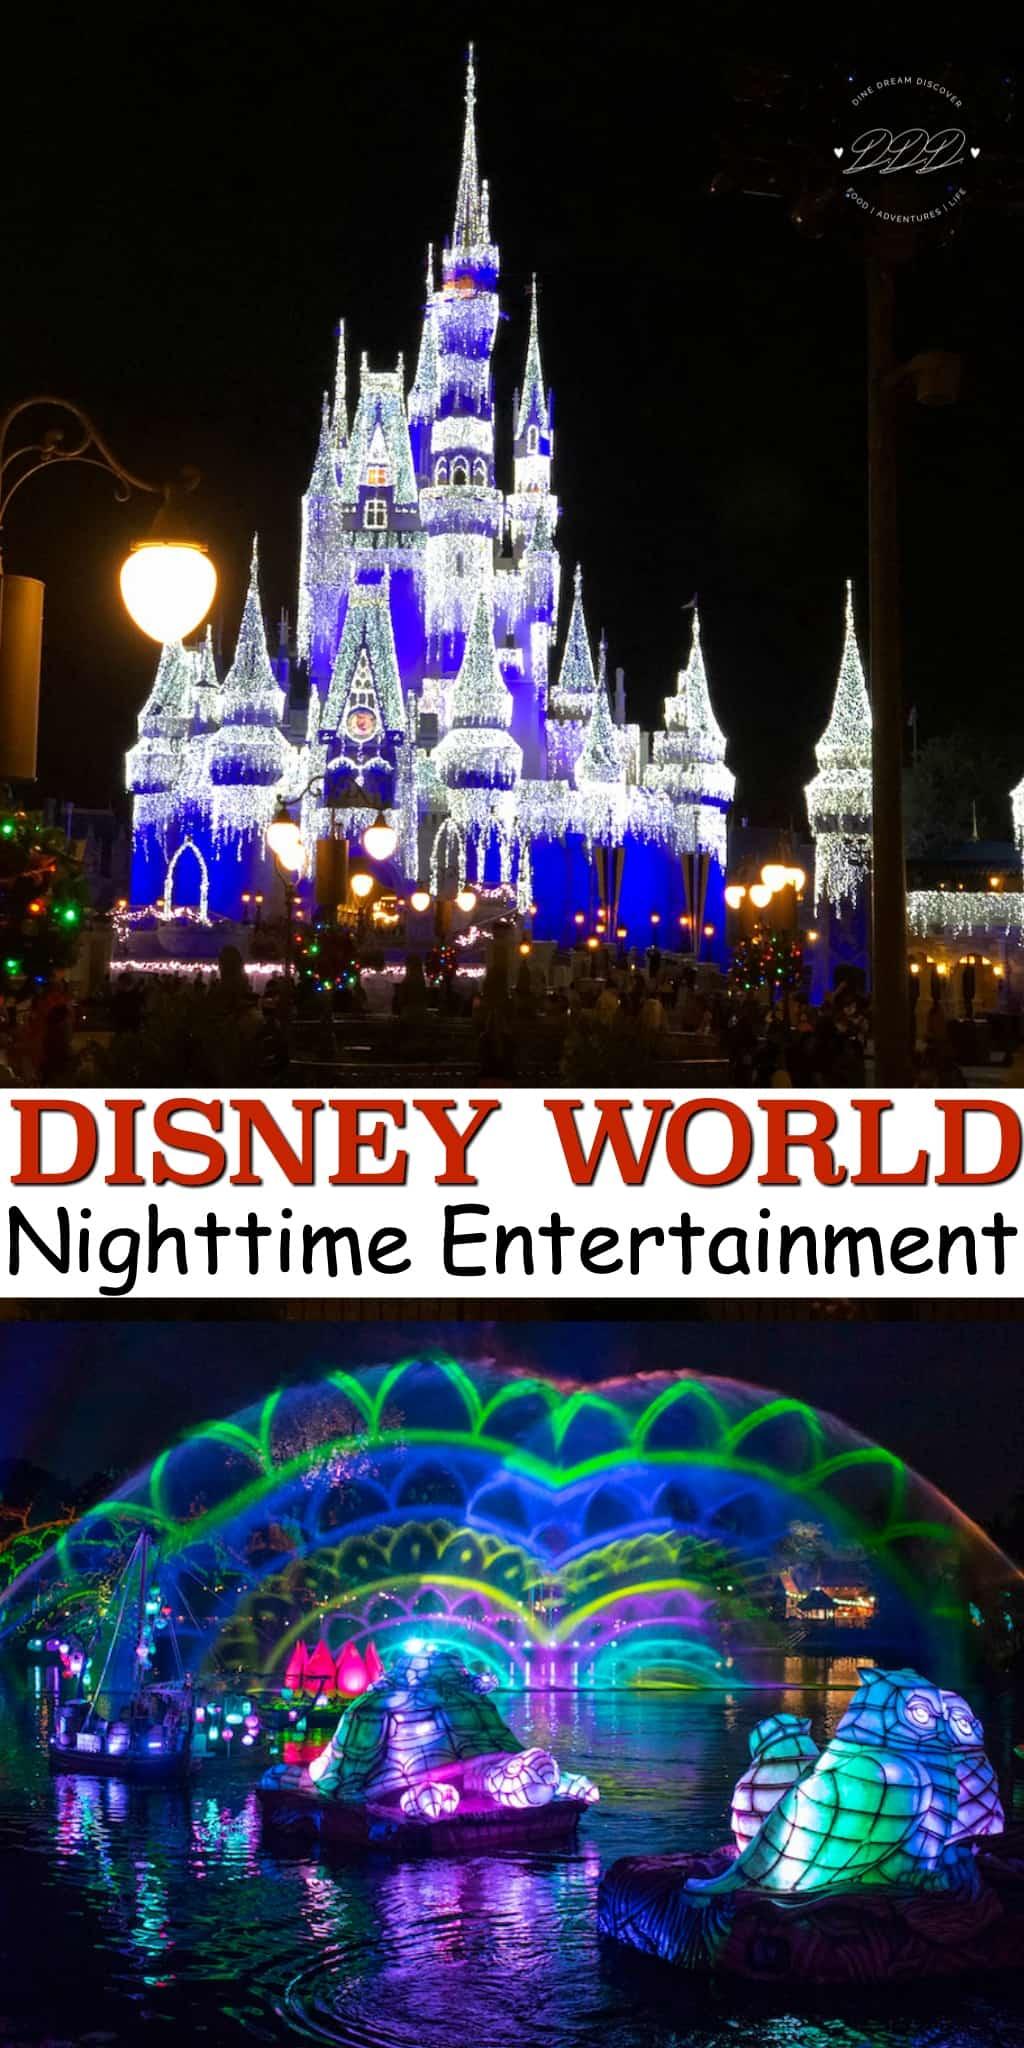 Disney World Nighttime Entertainment